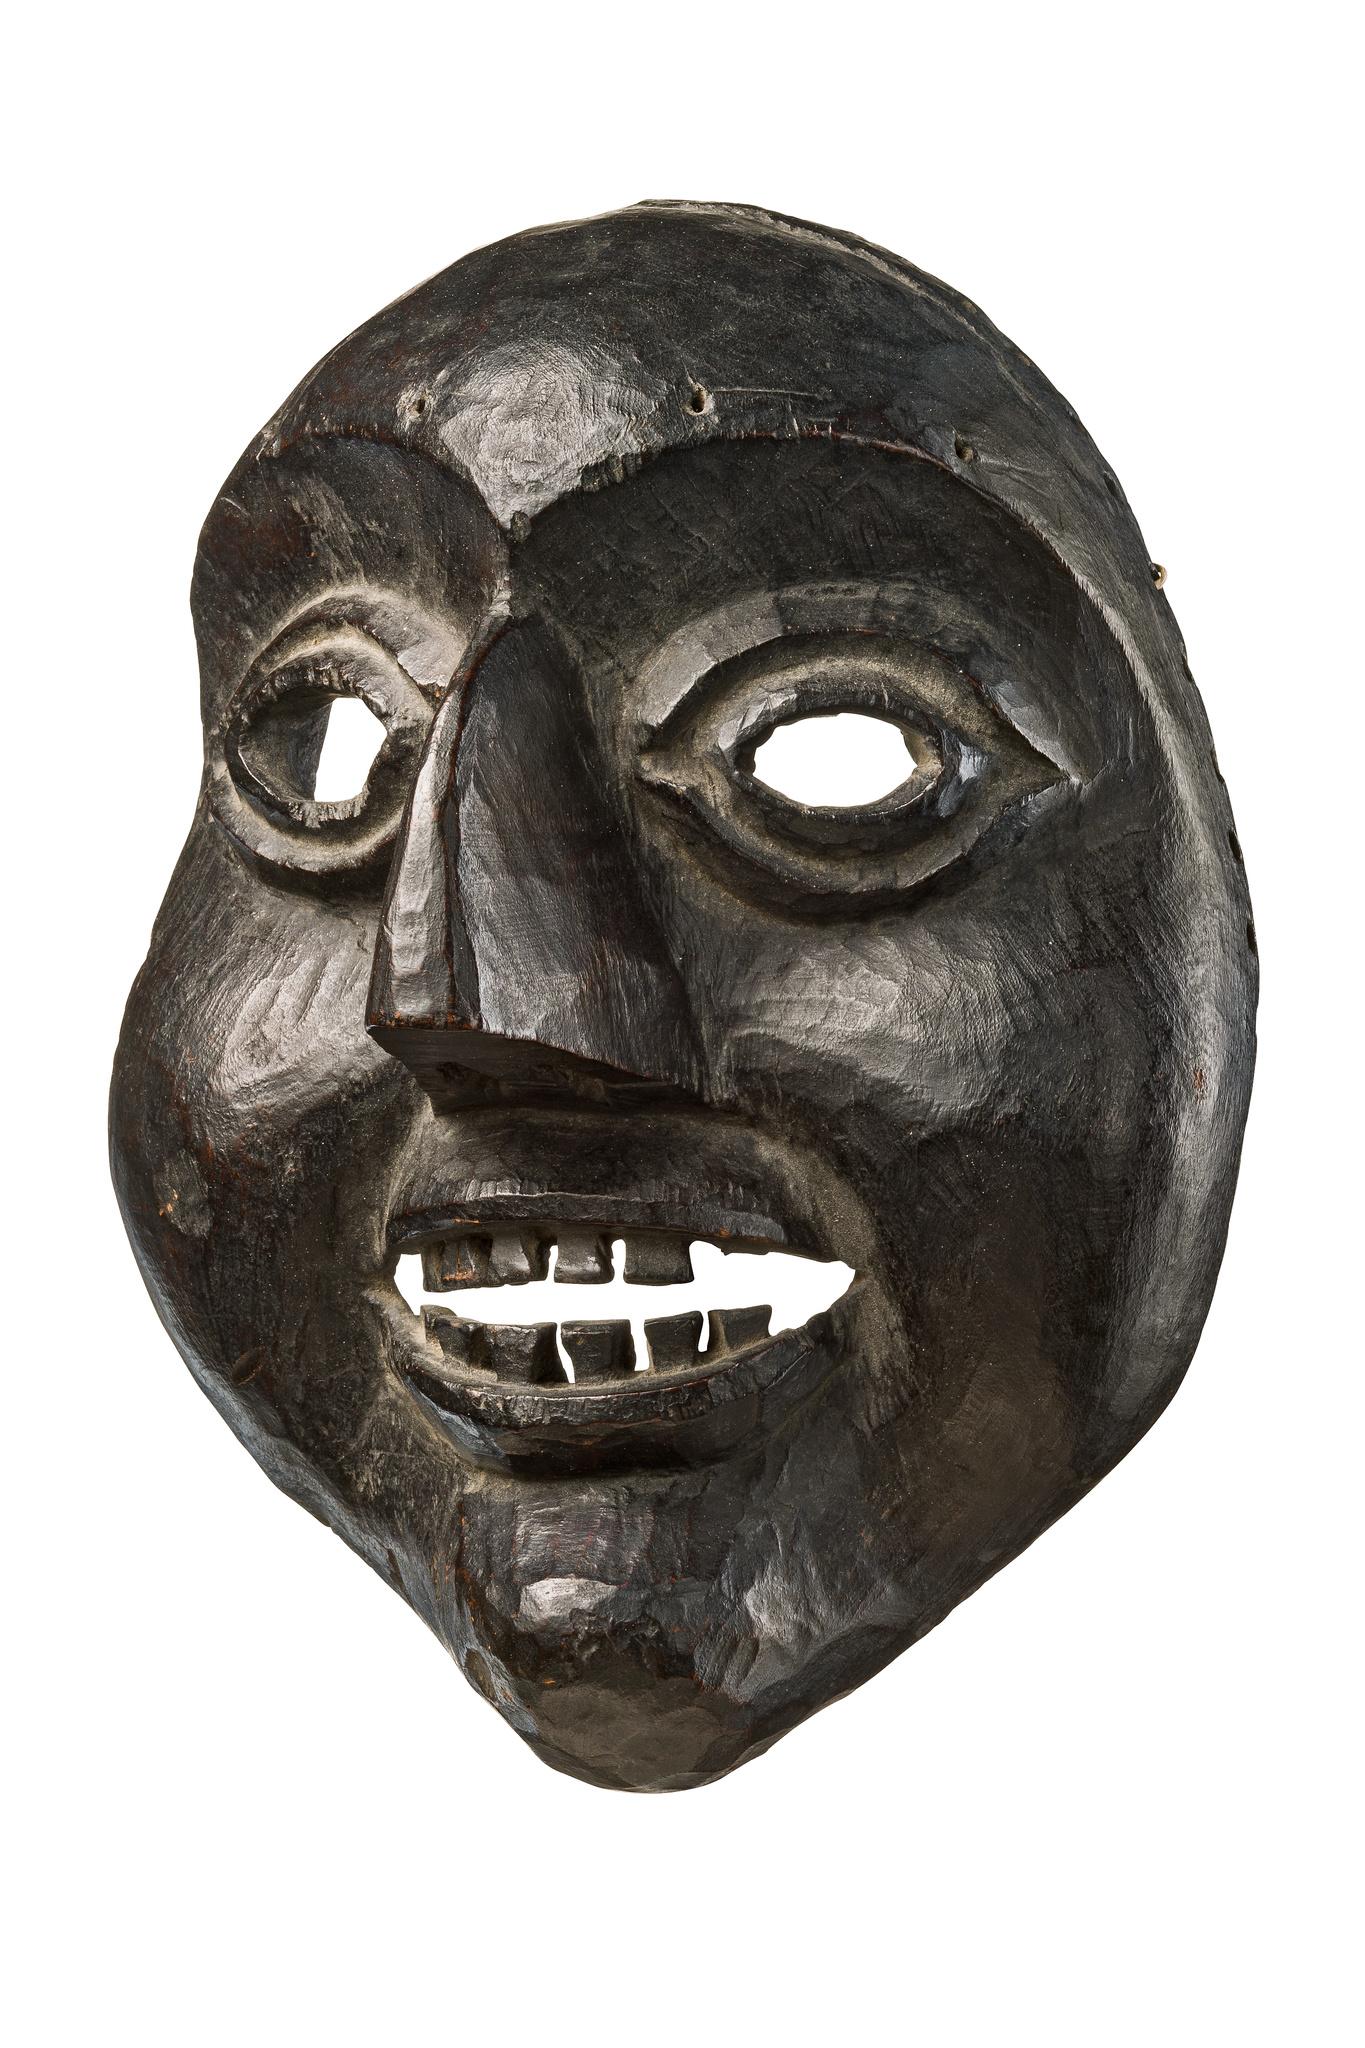 Anthropomorphe Maske mit übergroßer Nase